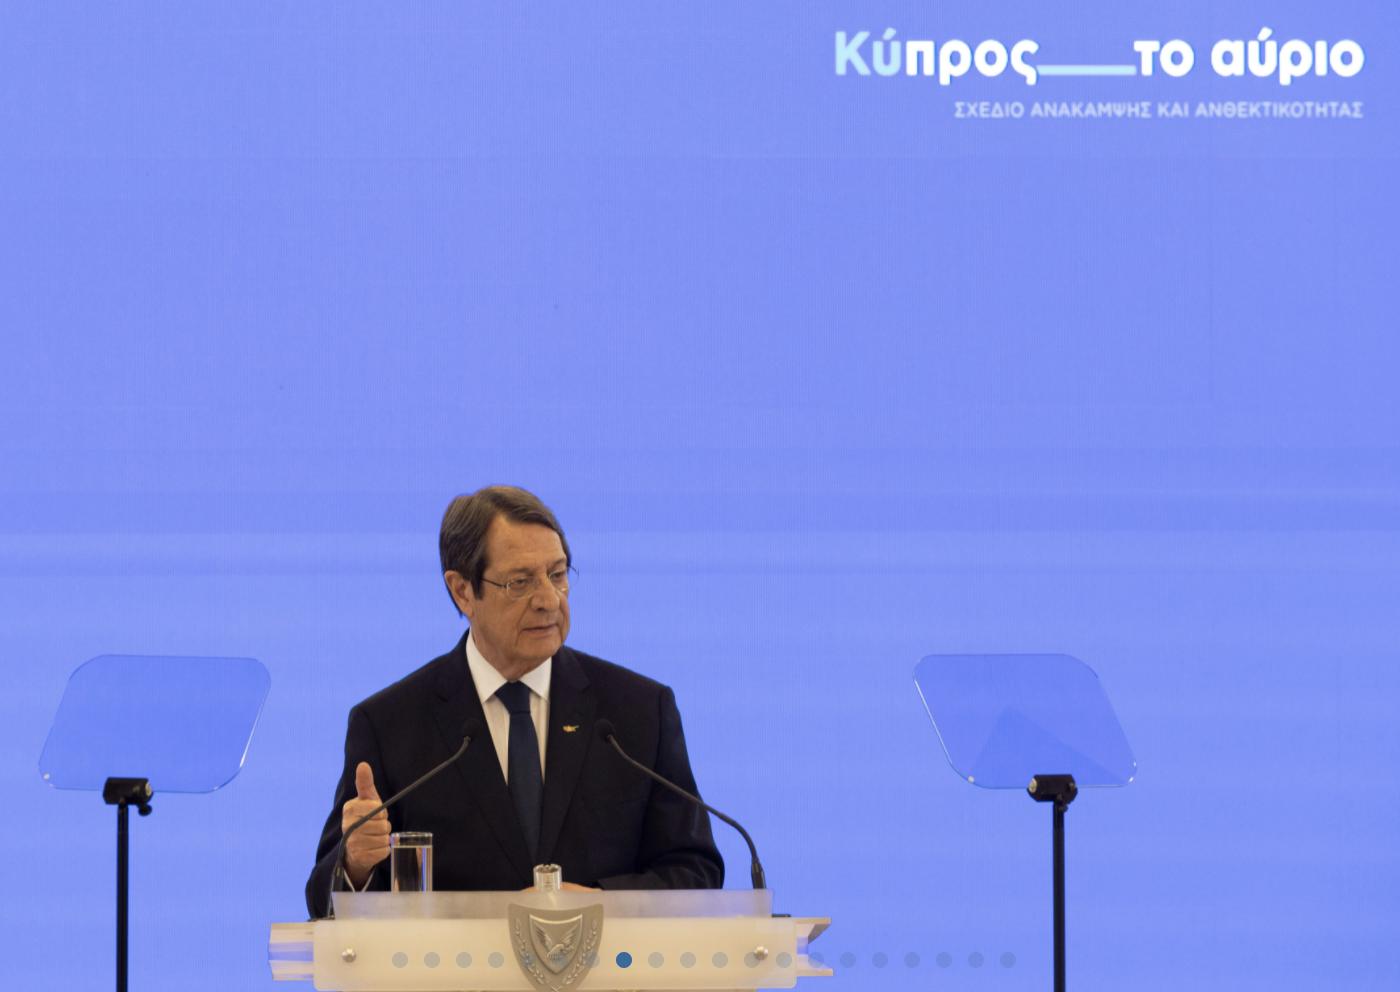 Kipar: Anastasiades ukazao na put Kipra u post-Covid eri